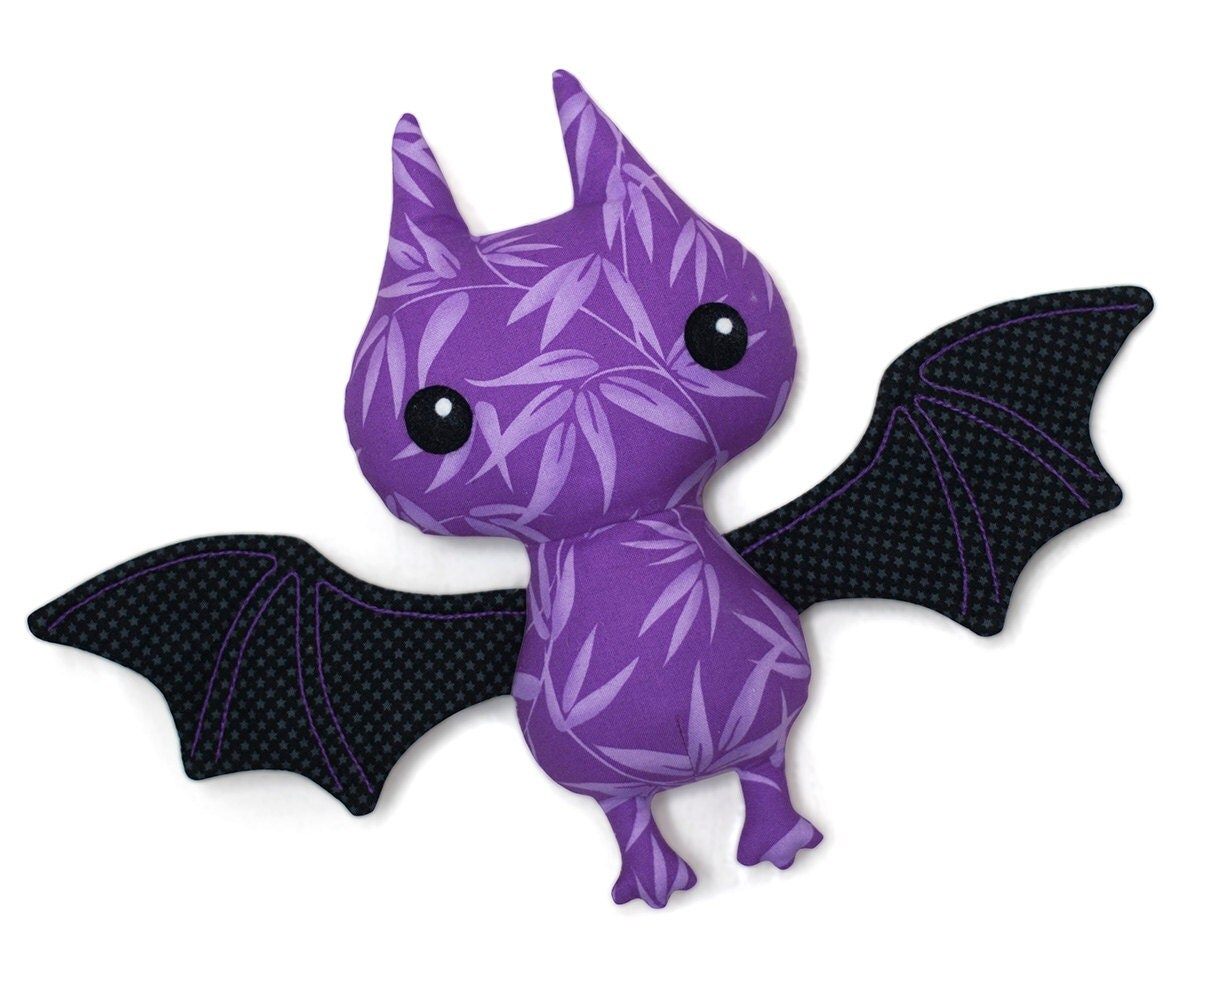 bat sewing pattern